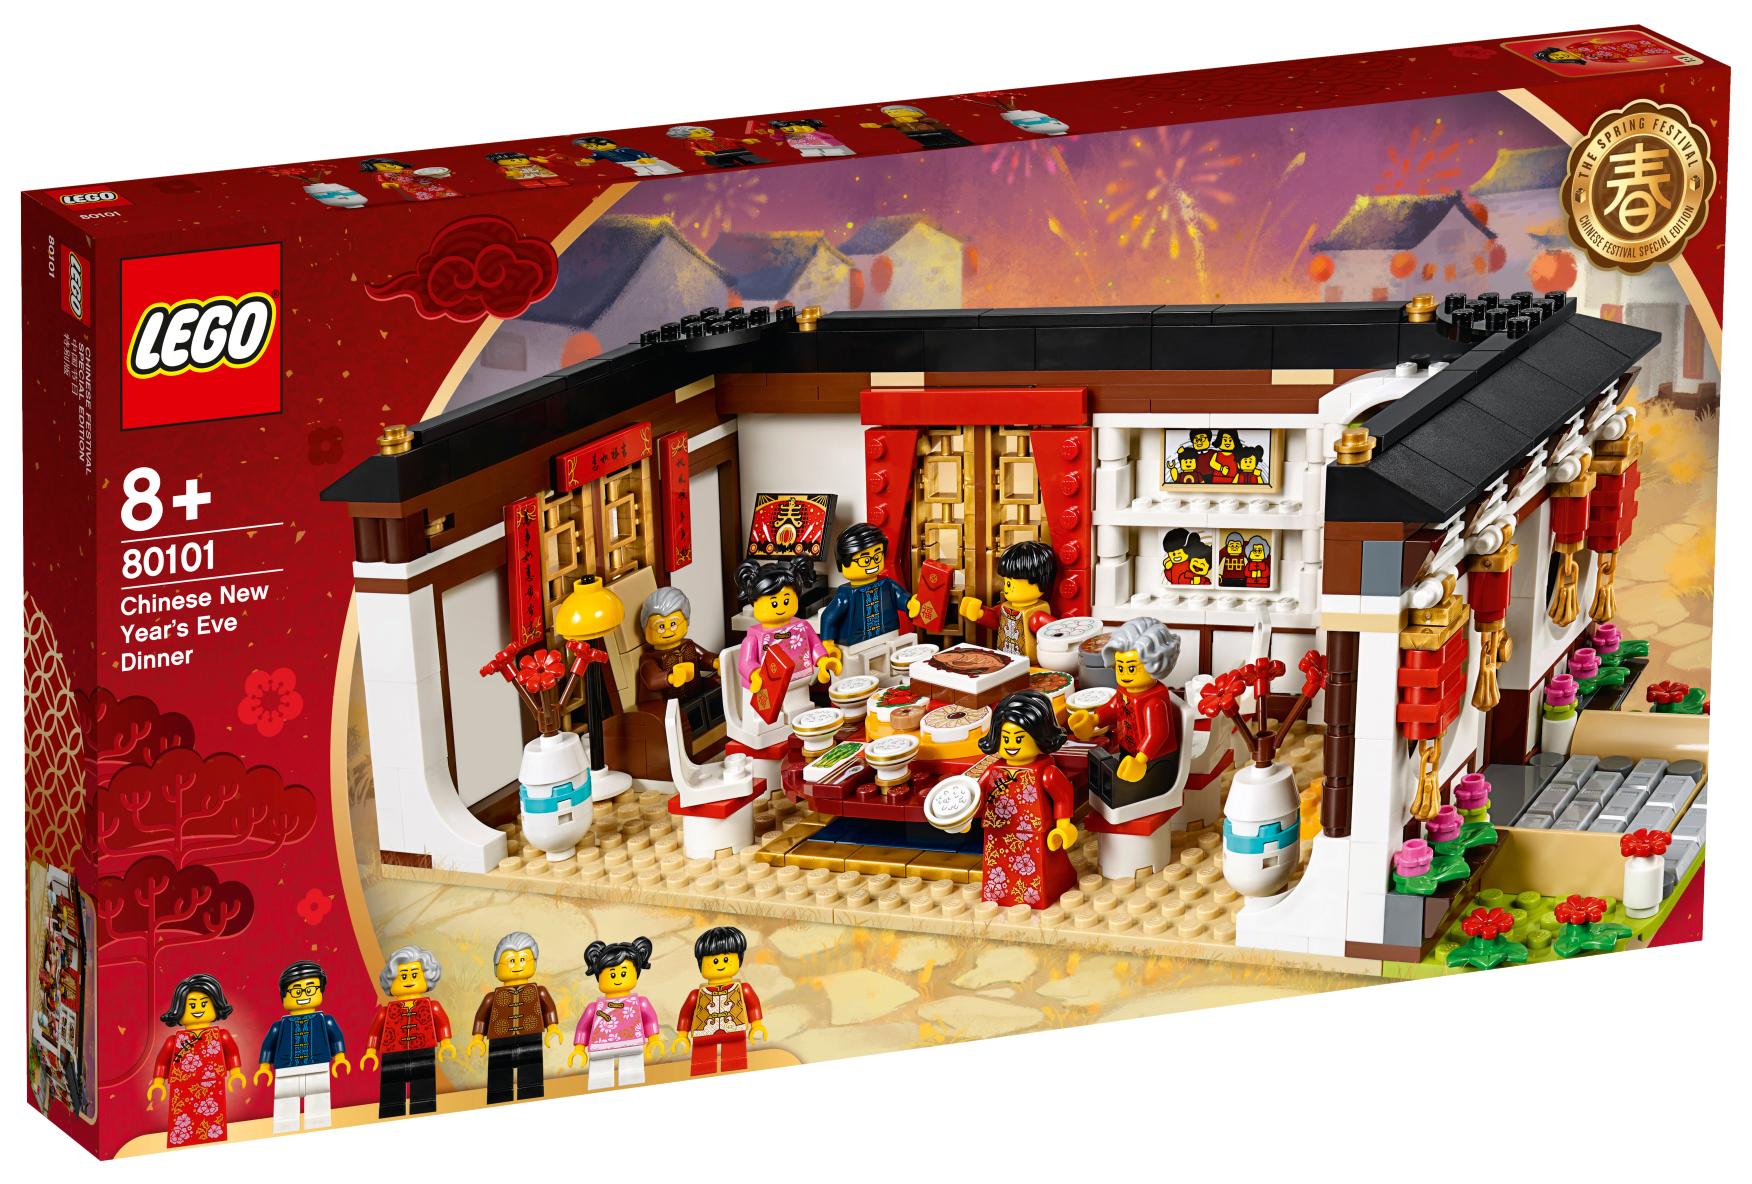 Lego Christmas Set 2019.Lego Christmas Sets 2019 Best Buy Appliances Clearance